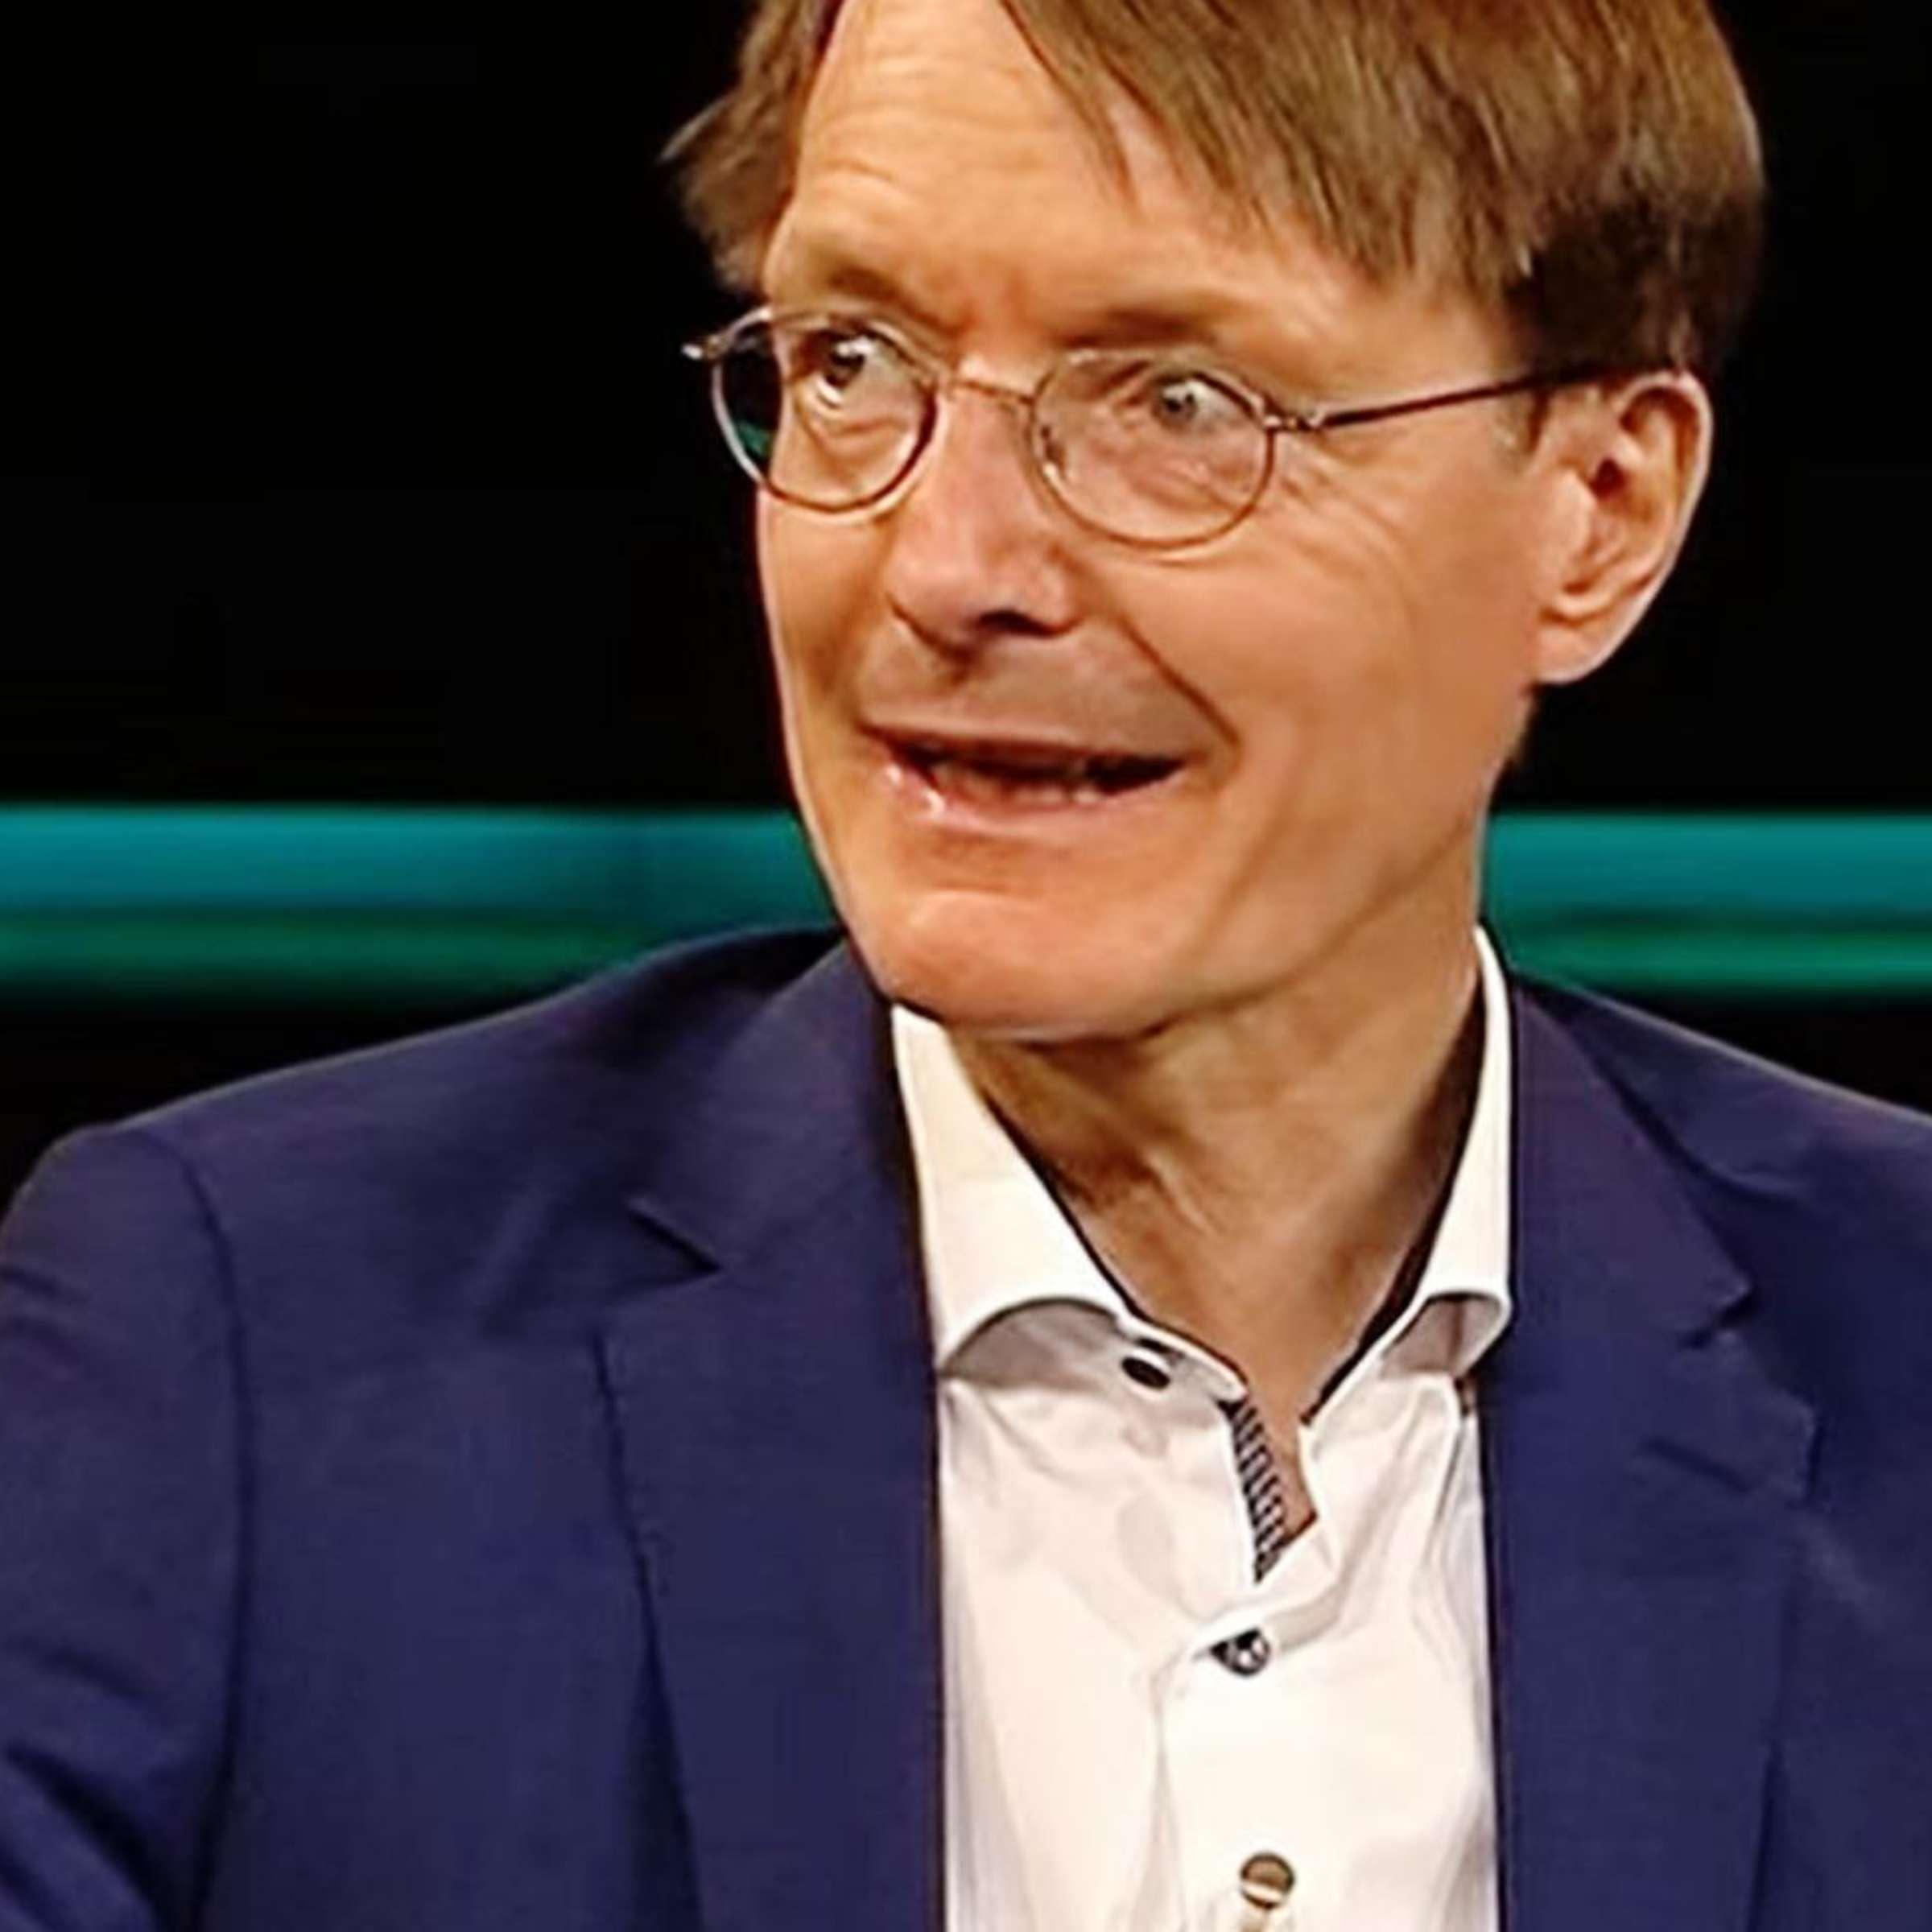 Markus Lanz Zdf Spd Politiker Karl Lauterbach Ubt Kritik An Coronavirus Regeln Wir Laufen Der Pandemie Hinterher Vip